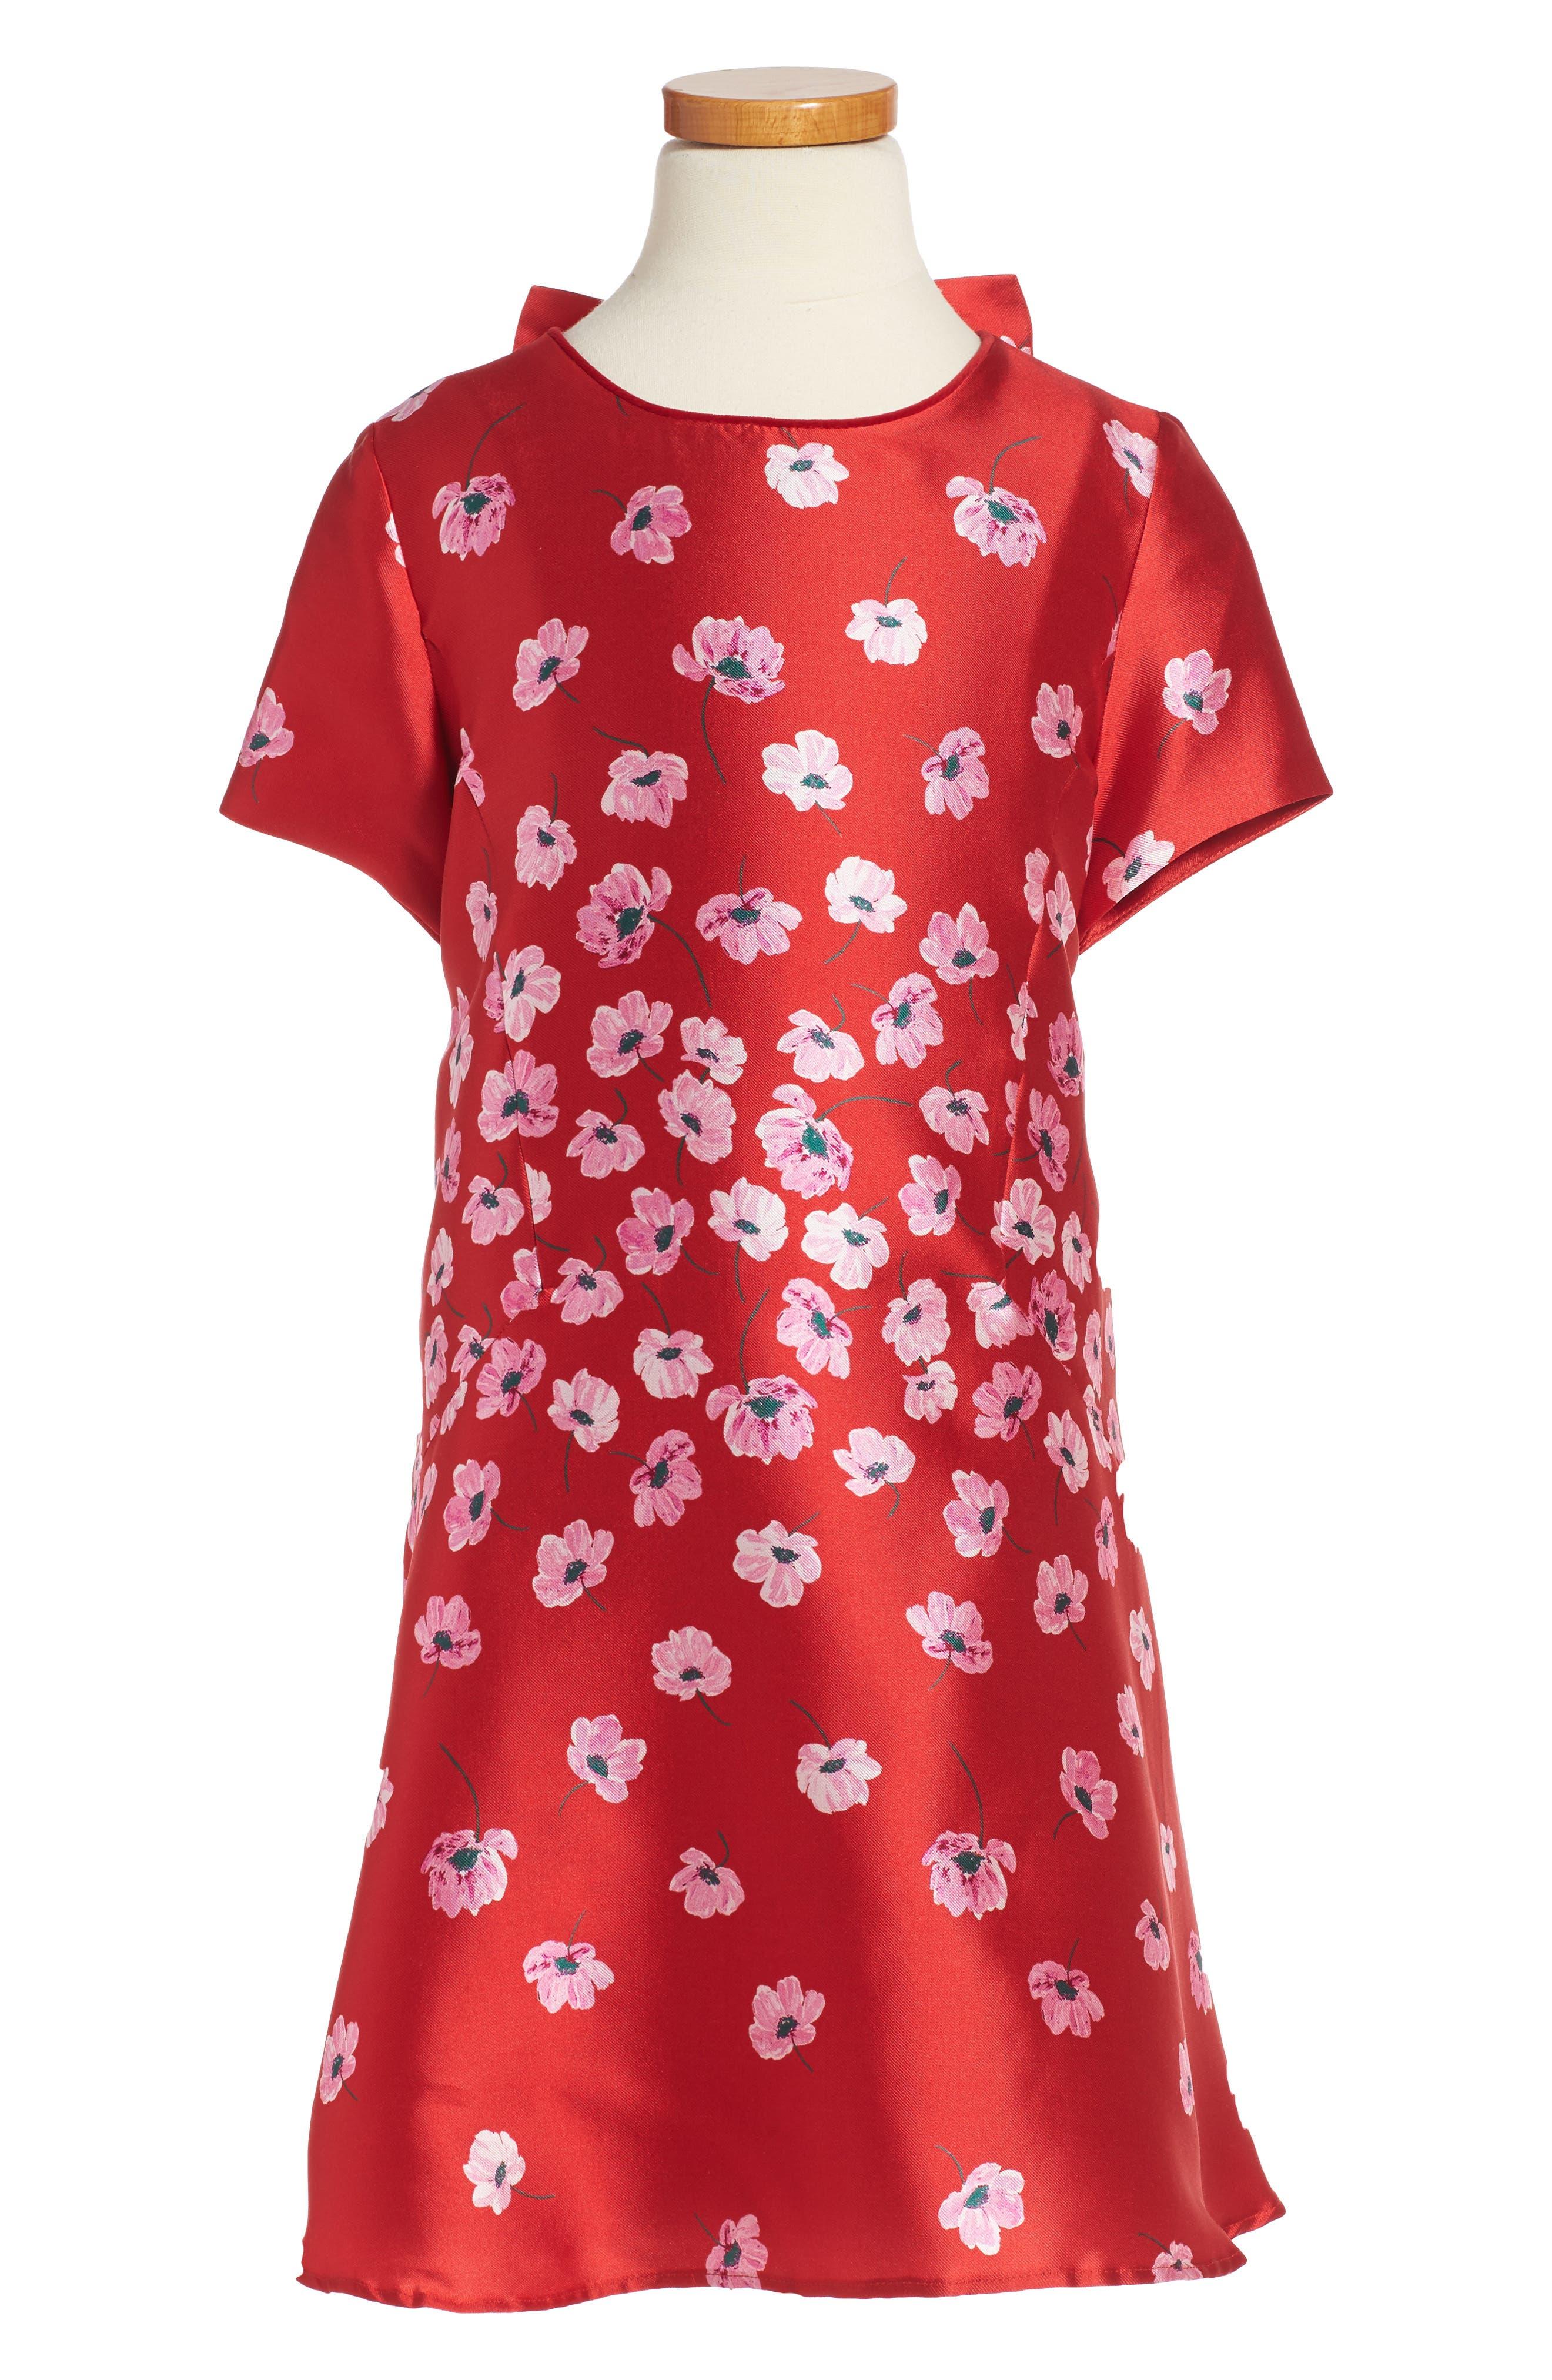 Main Image - Oscar de la Renta Poppies Mikado Dress (Big Girls)